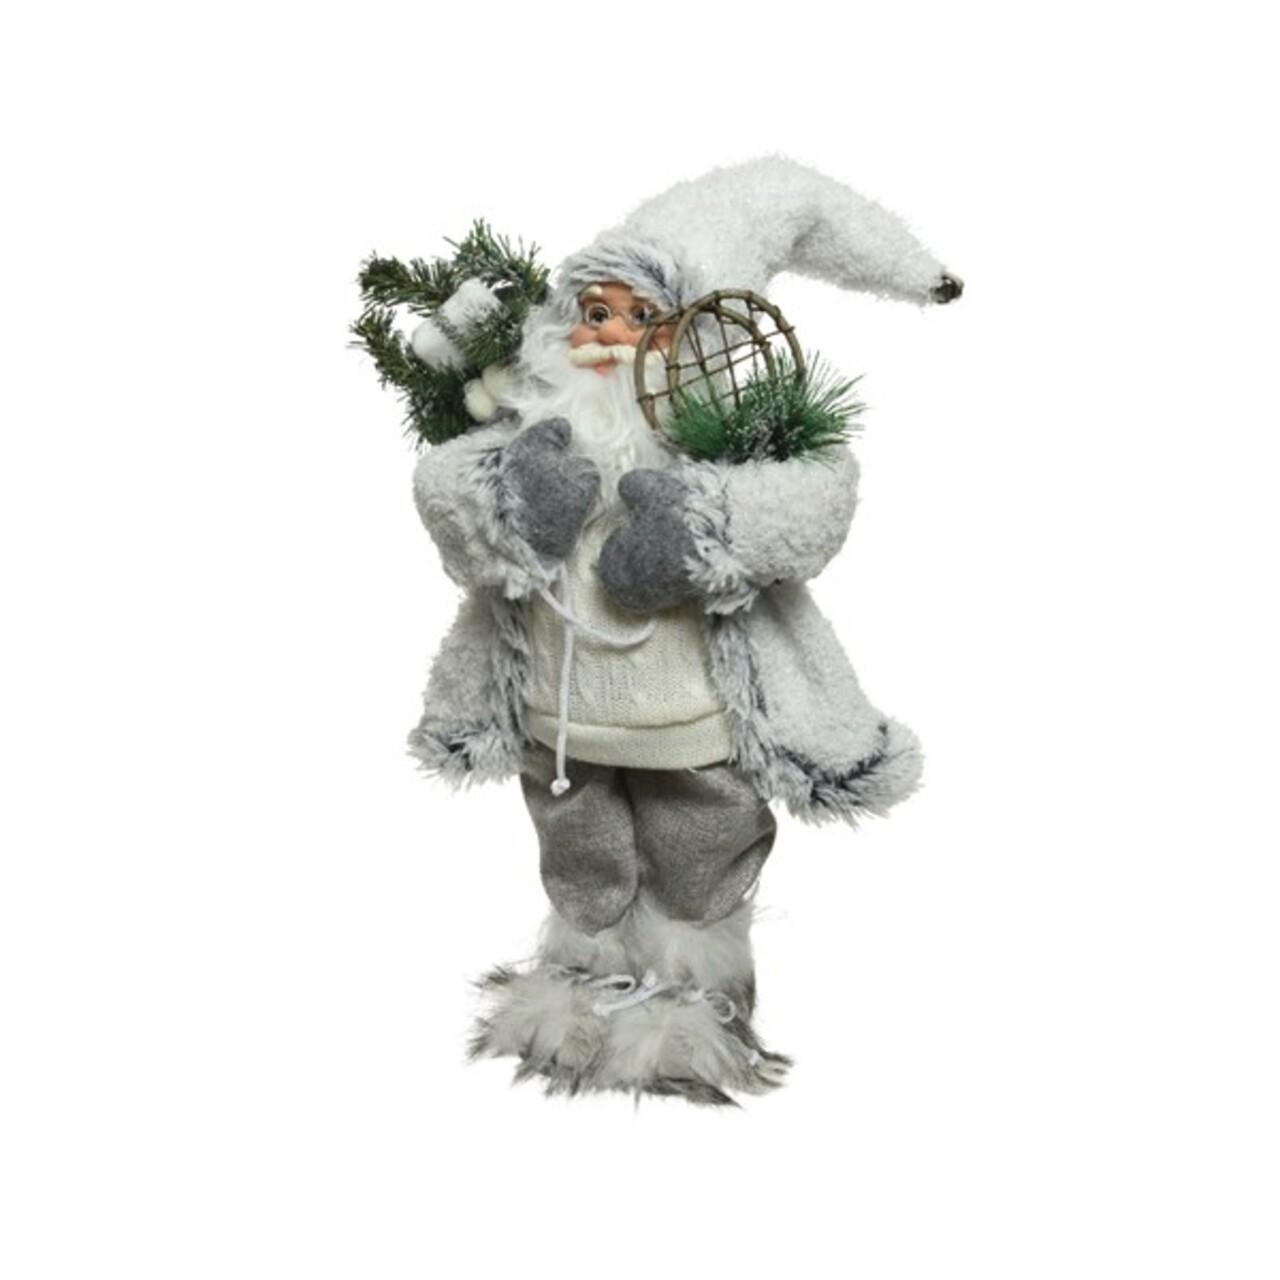 Decoratiune Santa w snow shoes, Decoris, H45 cm, poliester, alb